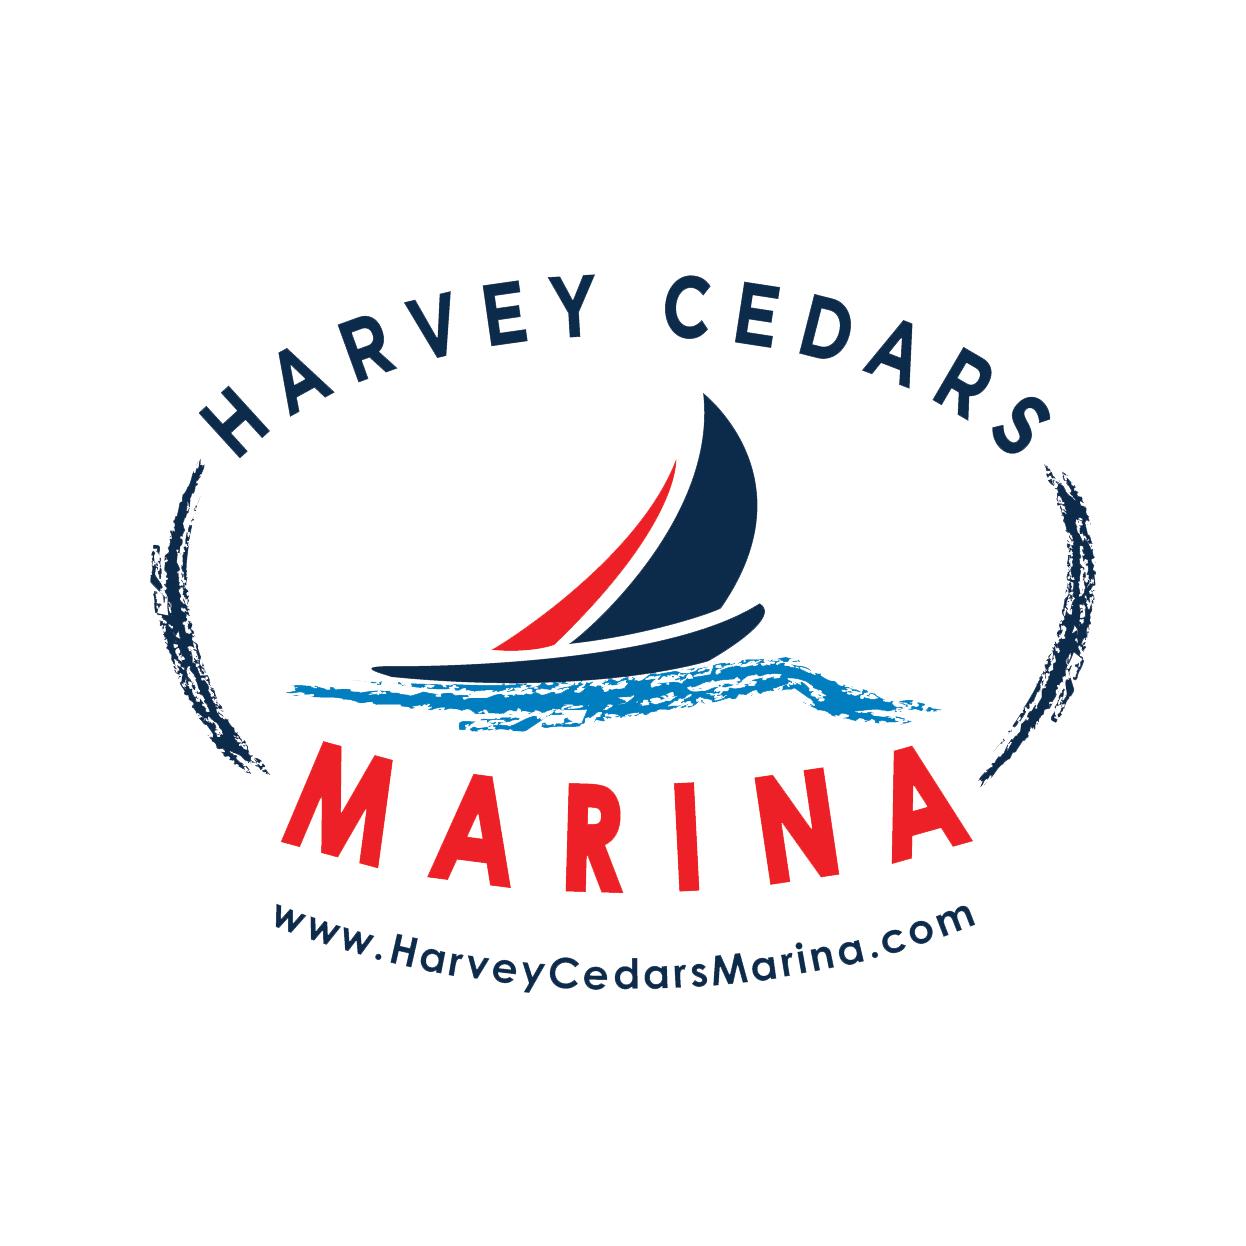 Harvey Cedars Marina